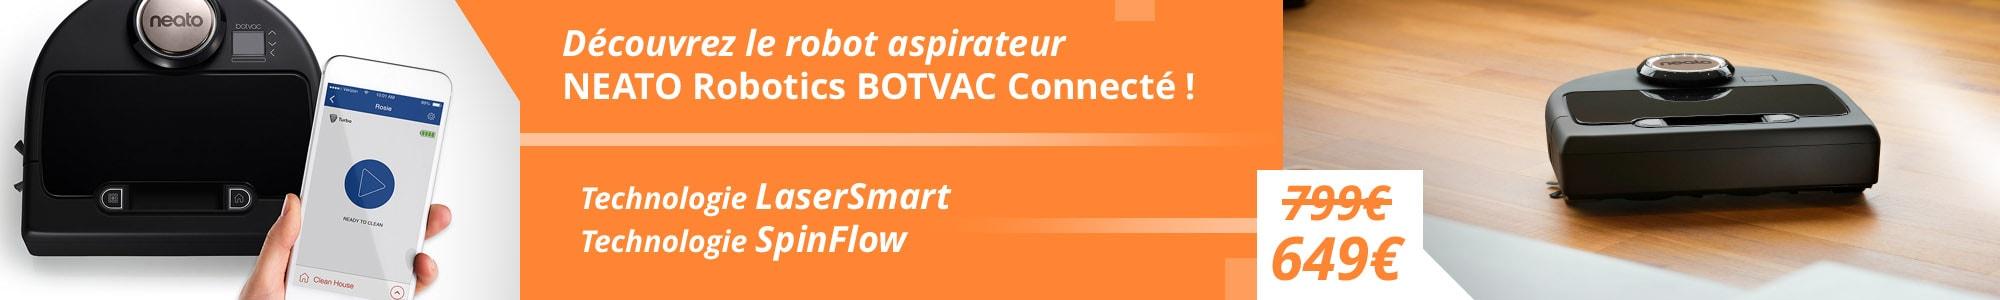 robot aspirateur BotVac connecté